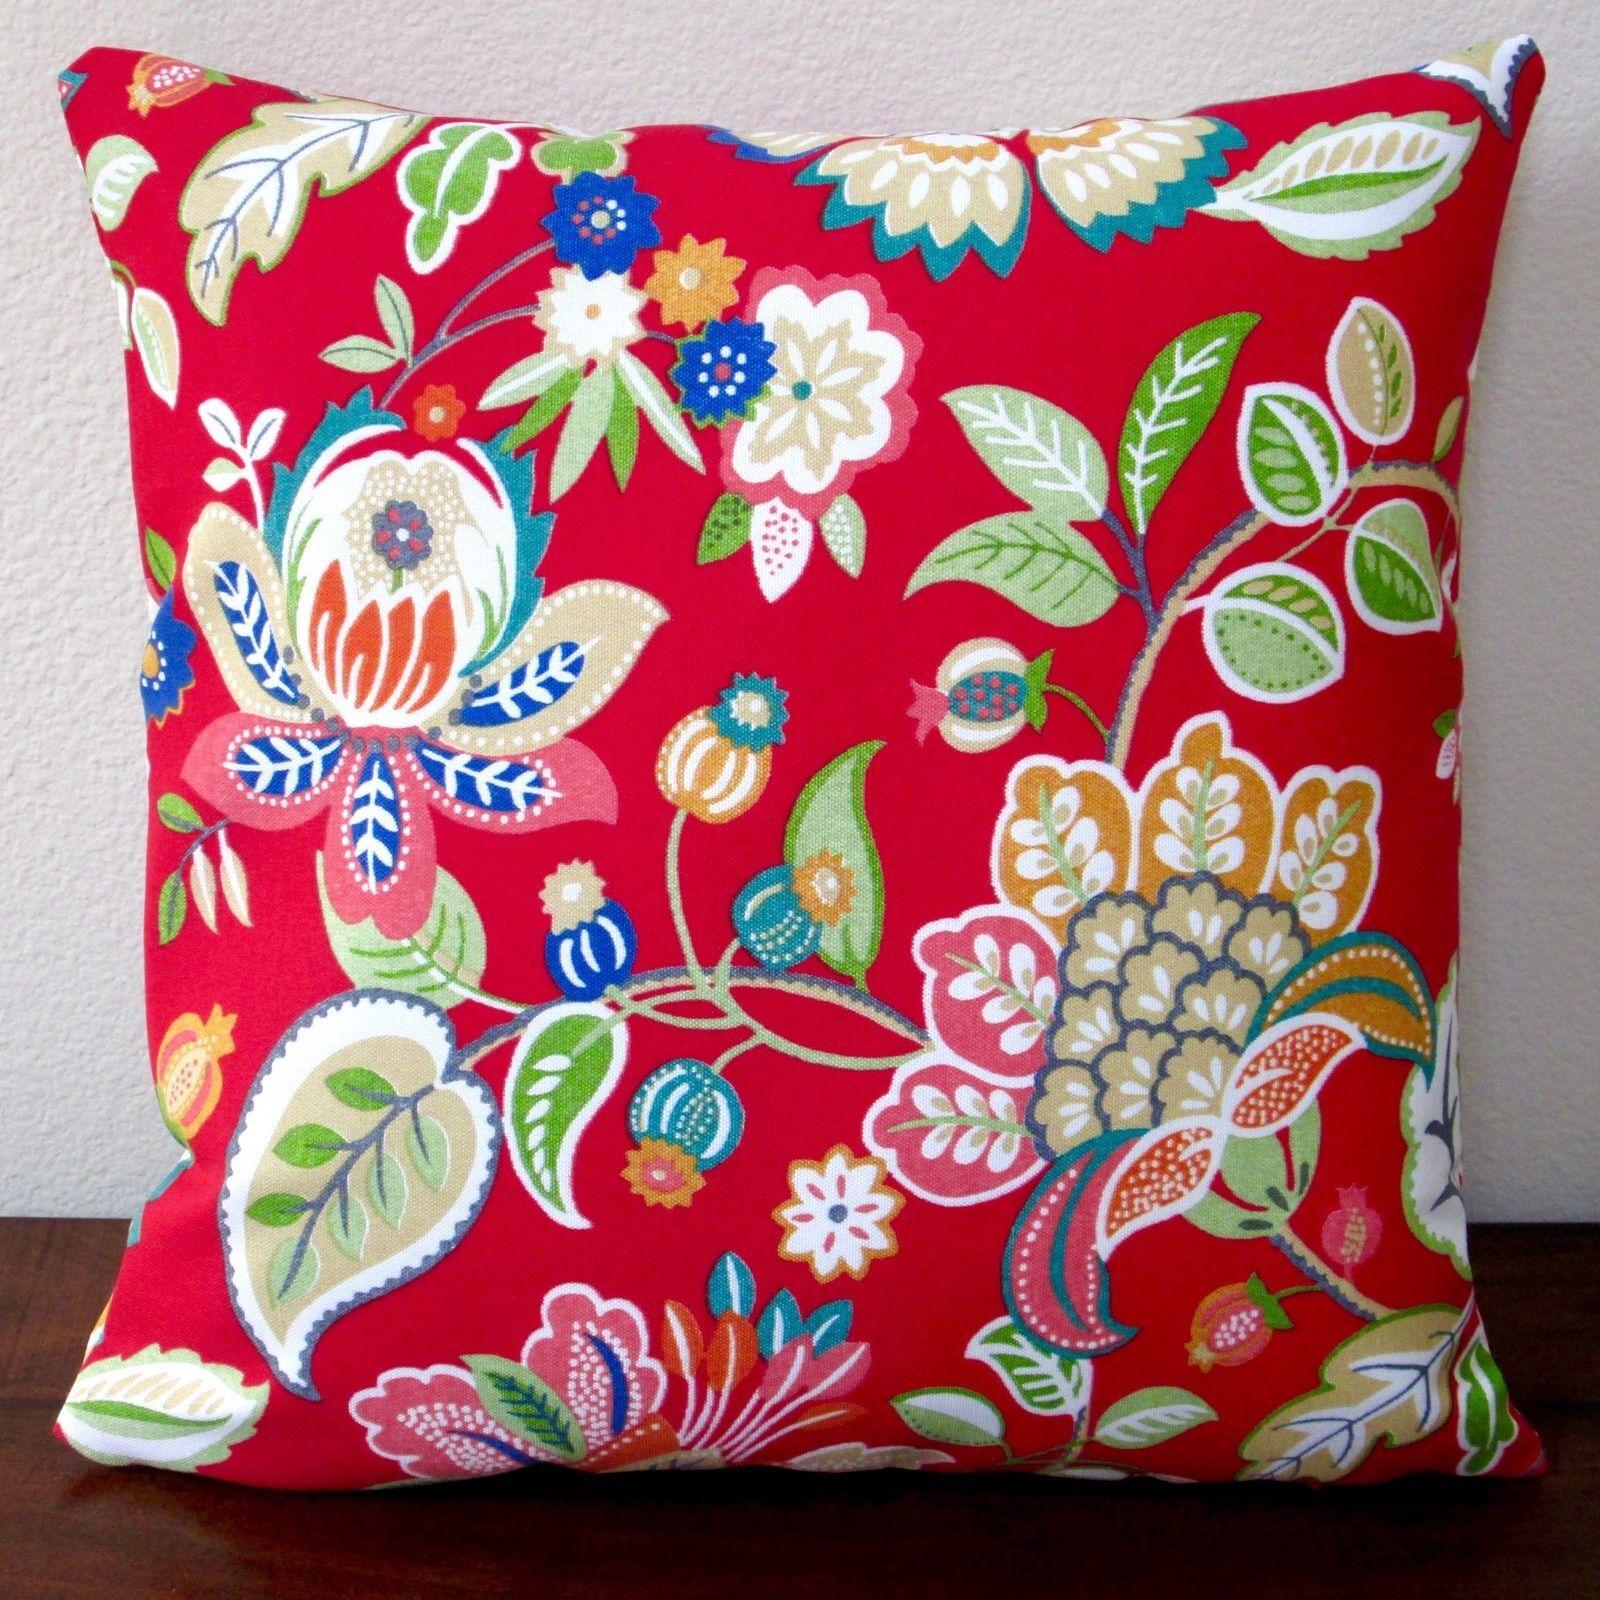 Floral in Modernative Outdoor Throw Pillow